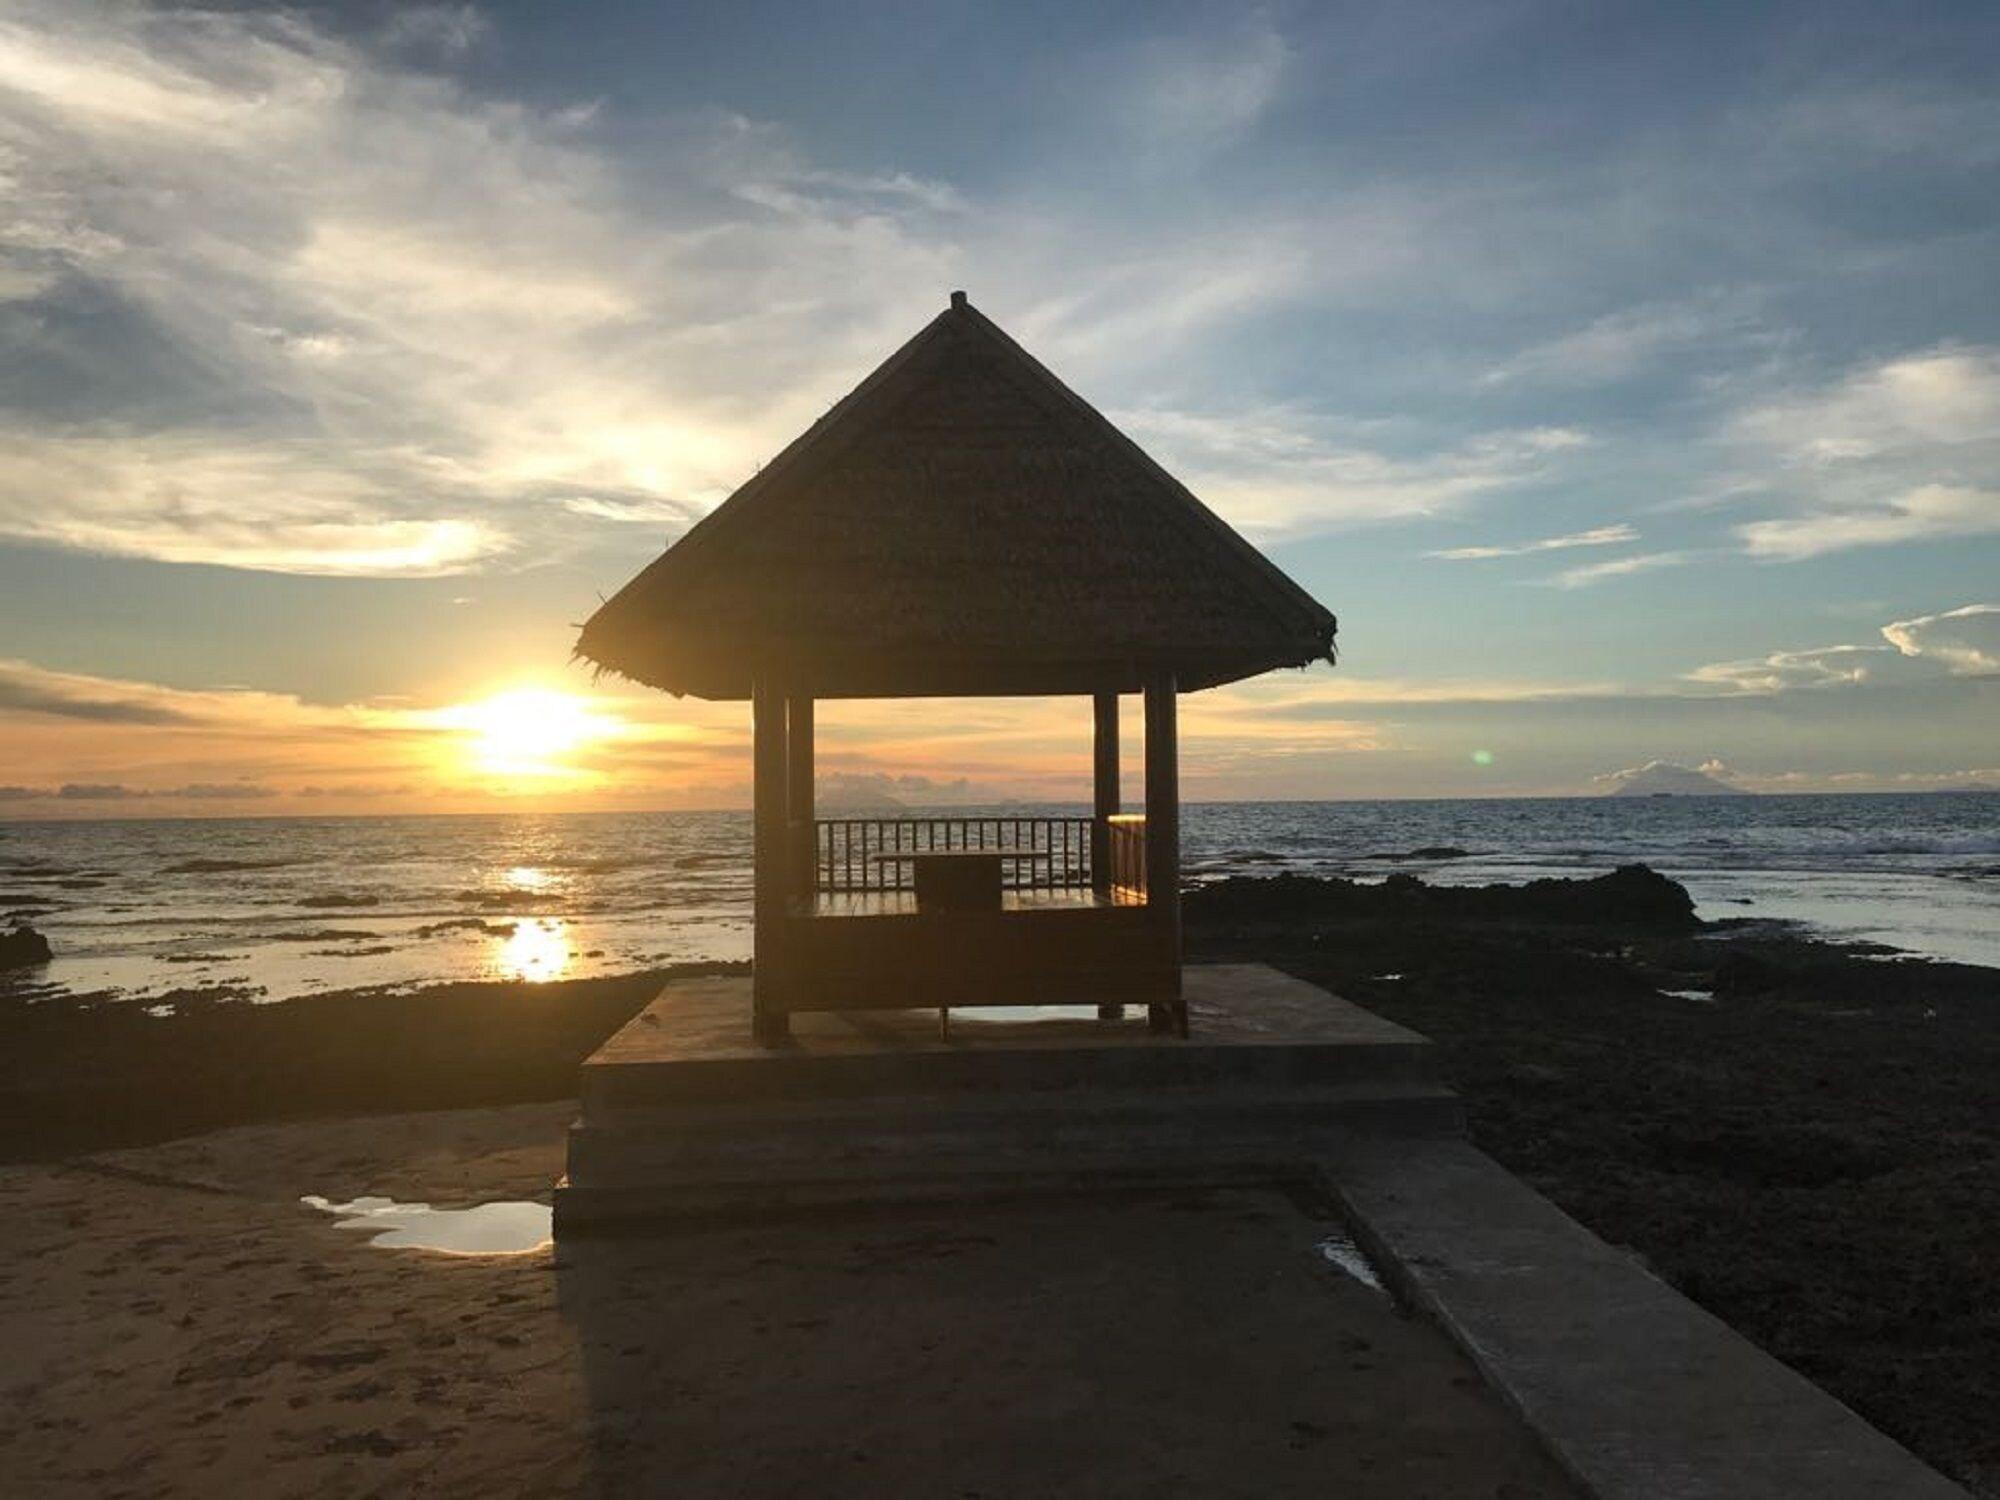 Double G Resort Anyer, Serang